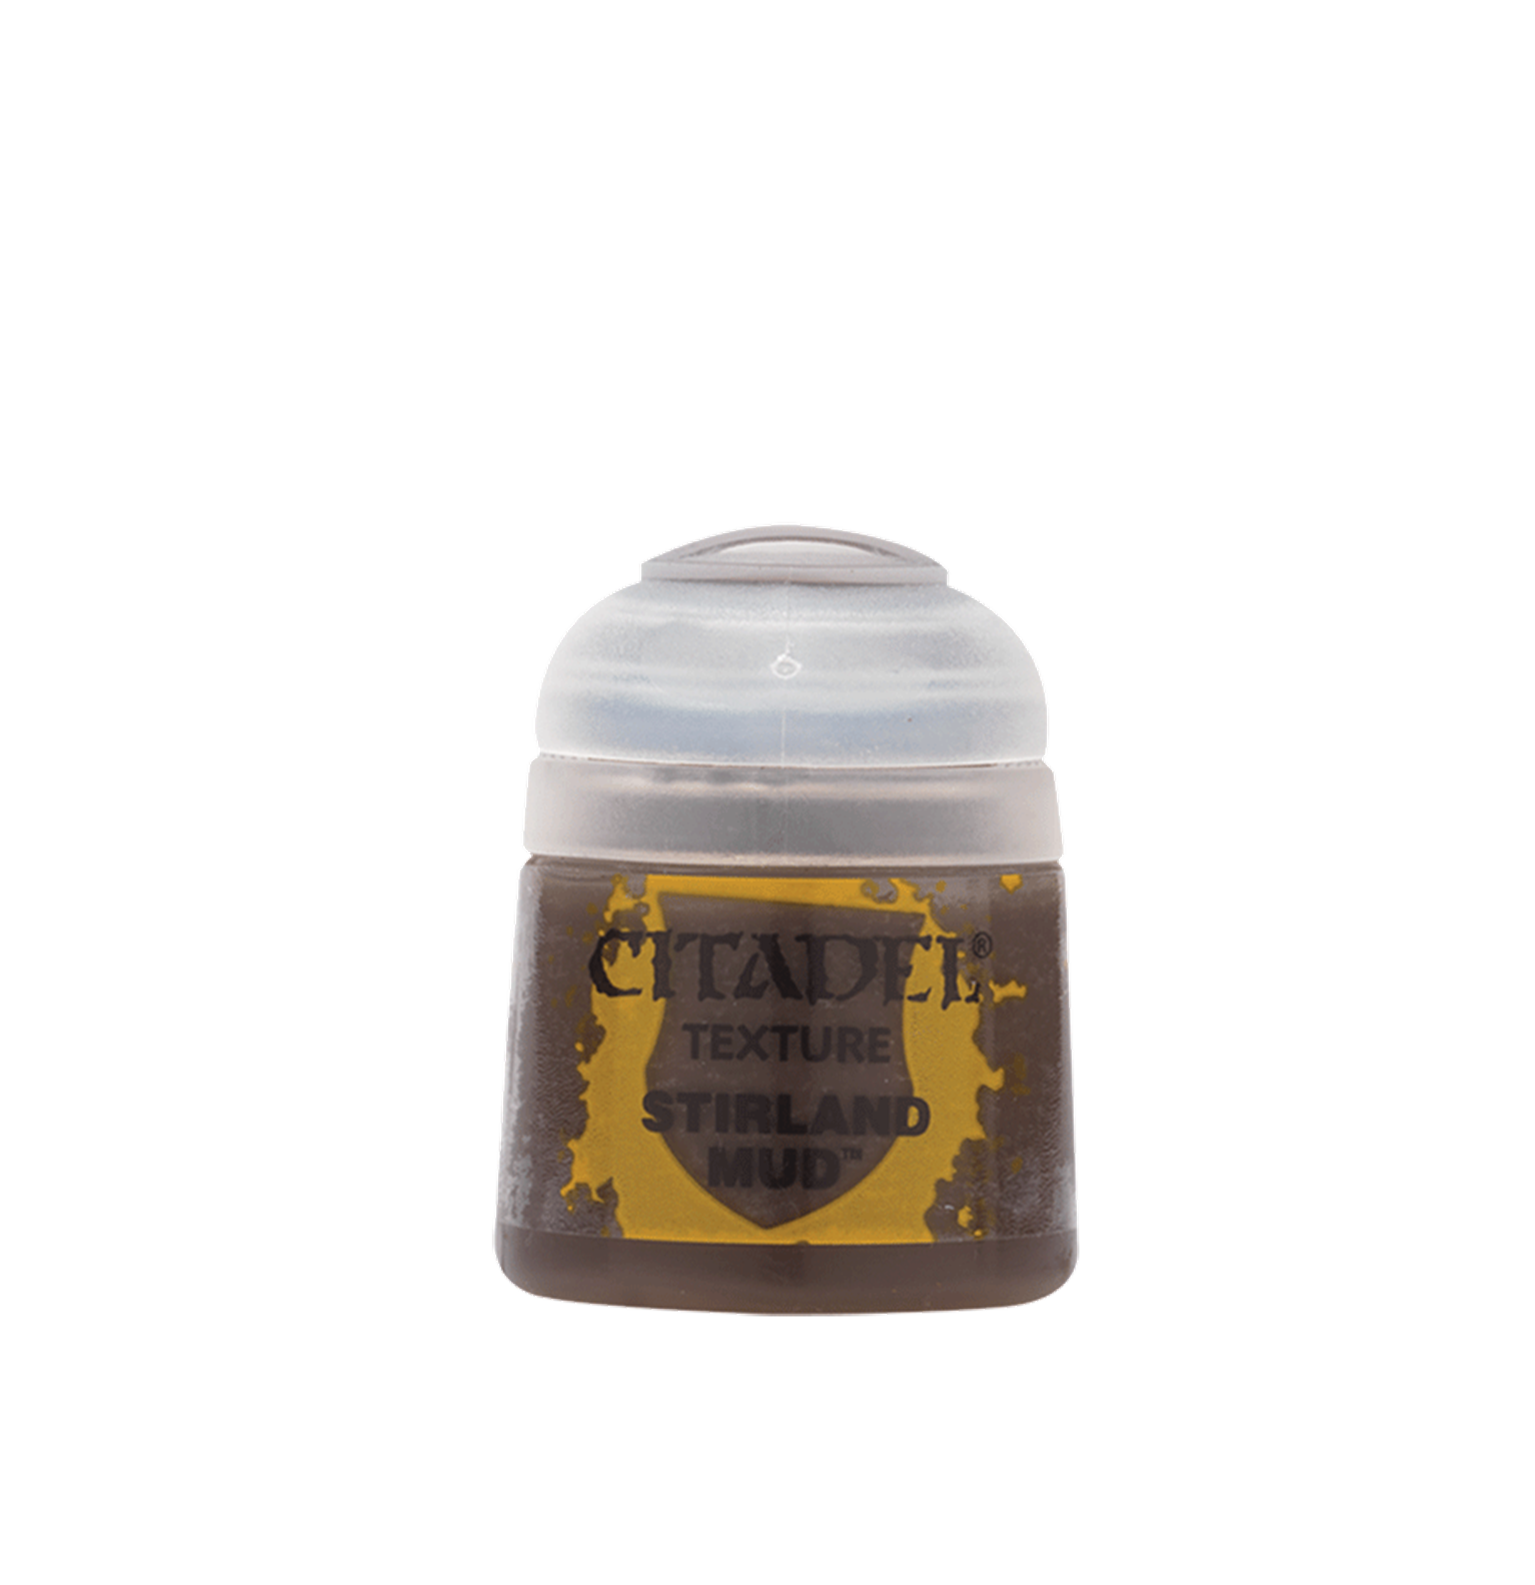 Citadel Technical Stirland Mud Paint Pot